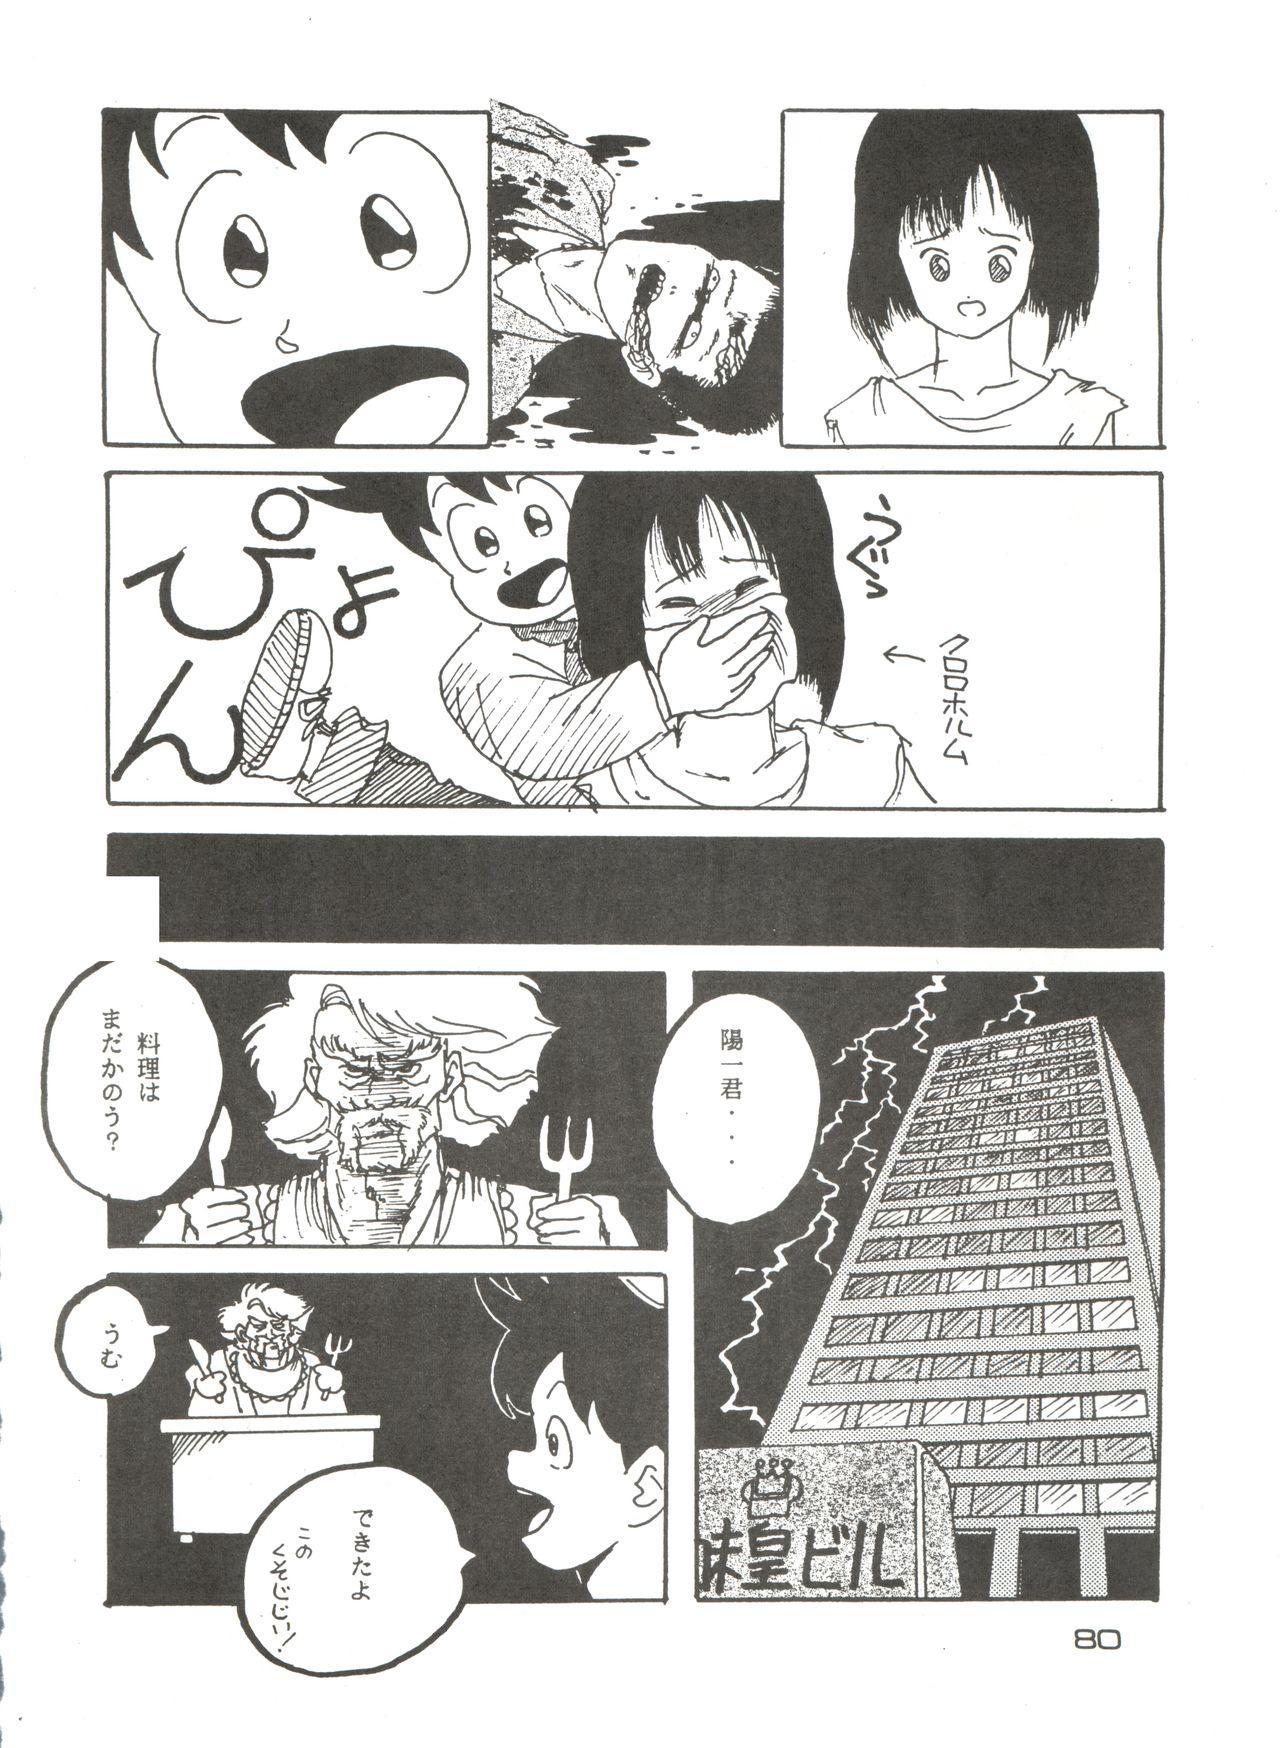 [Studio Fuck (Various) Onapet 7 (Sonic Soldier Borgman, Gundam ZZ, Osomatsu-kun) 79